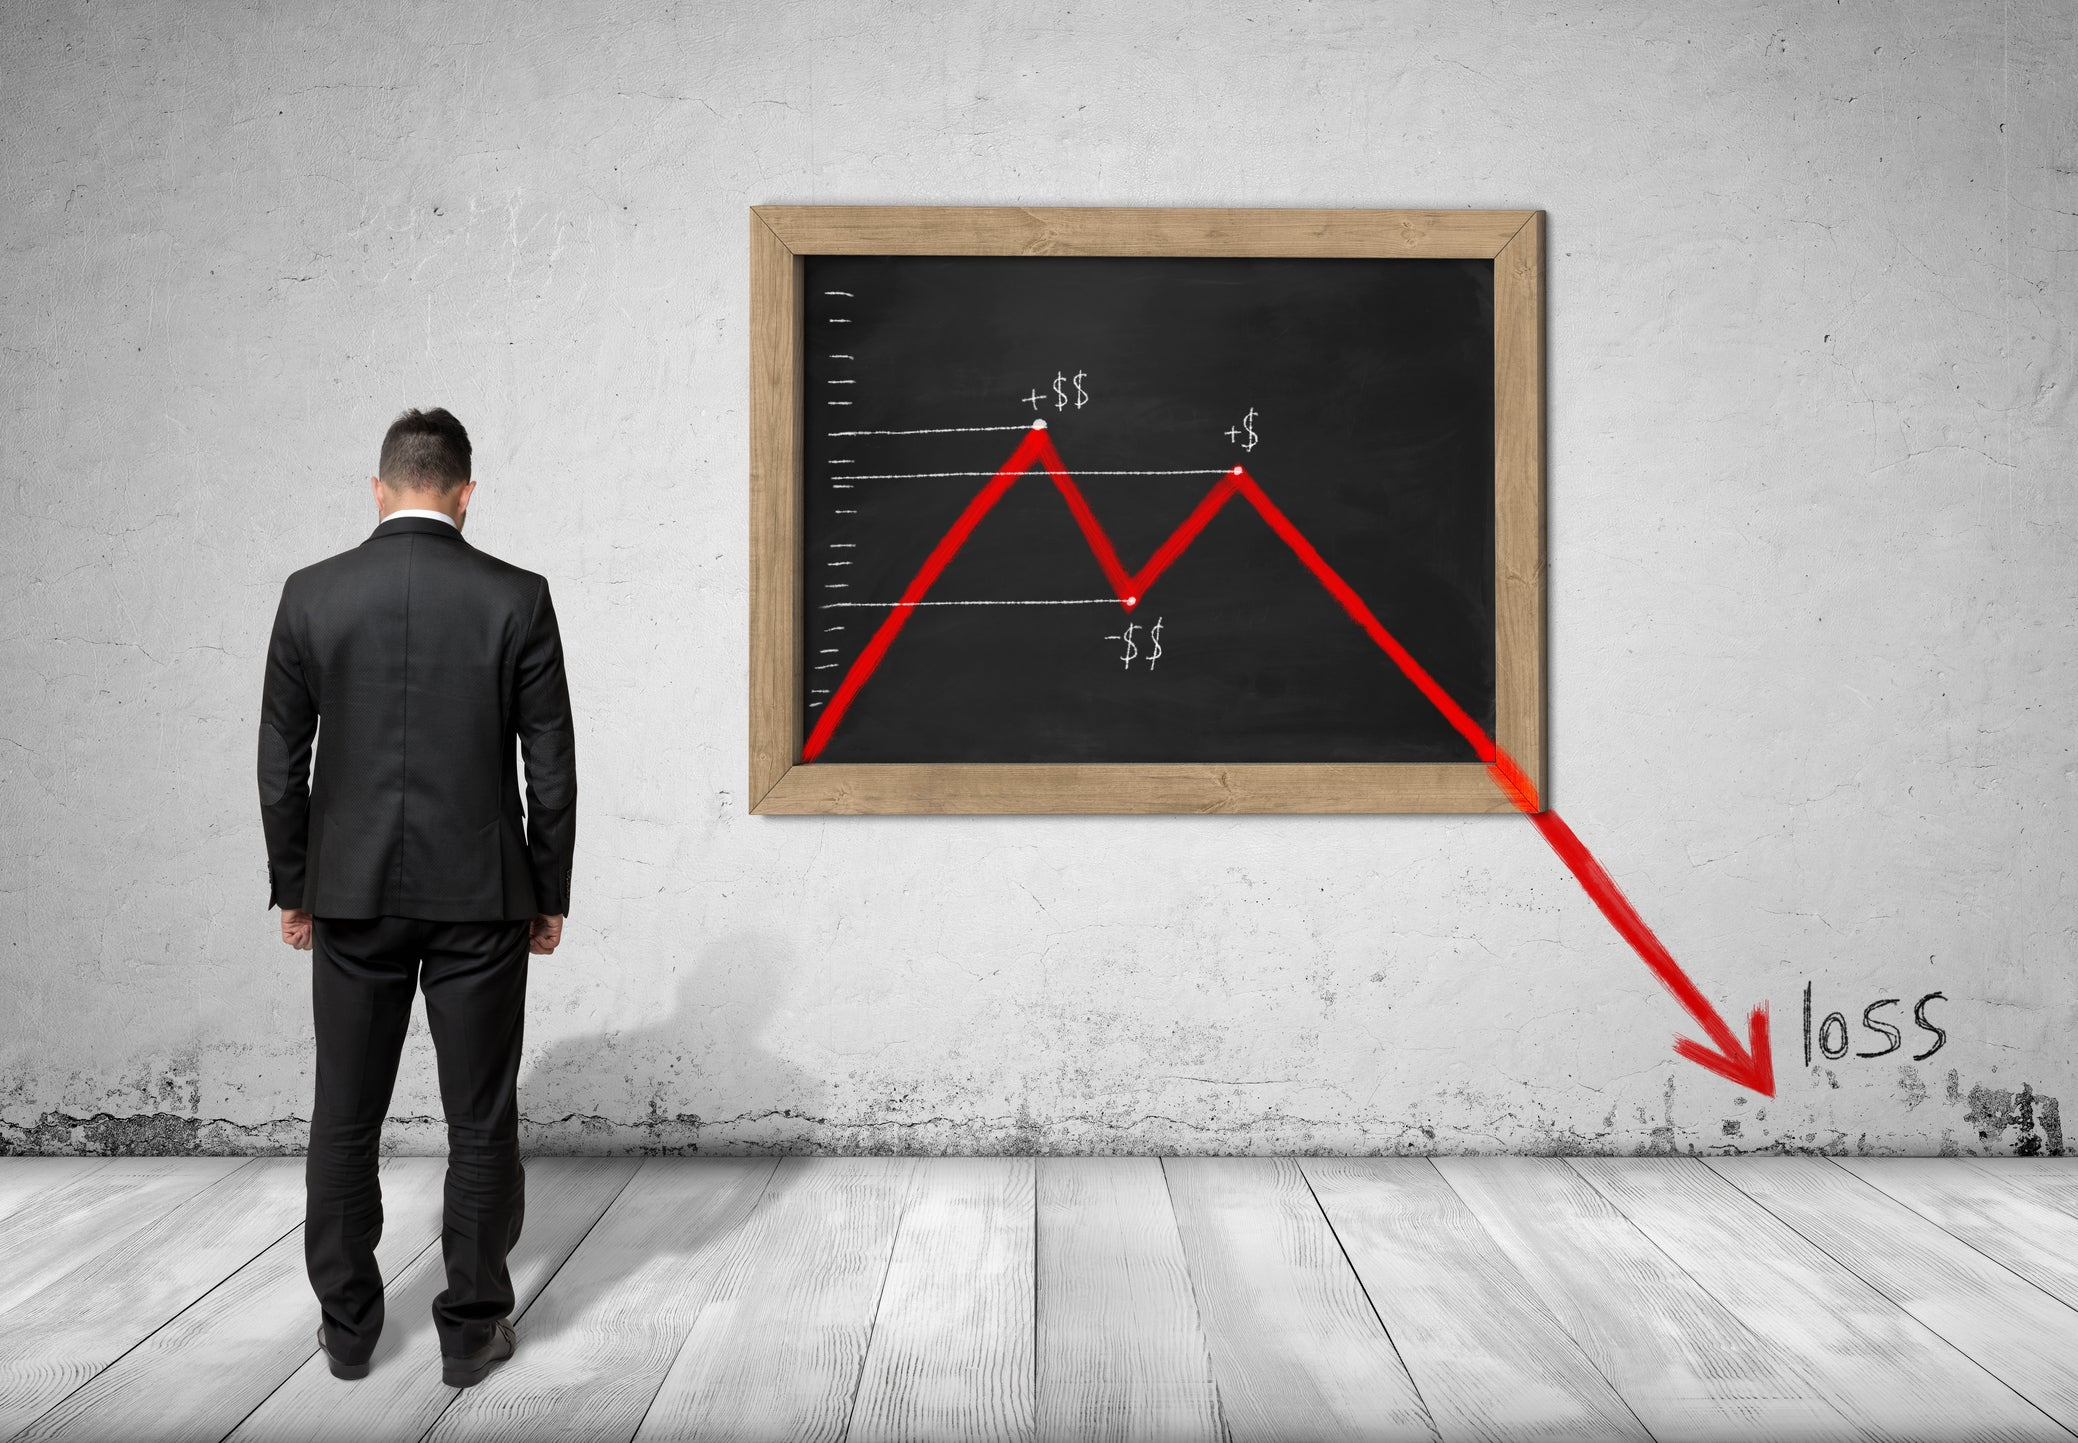 Celgene Stock Quote | Here S Why Celgene Corporation Fell In February The Motley Fool